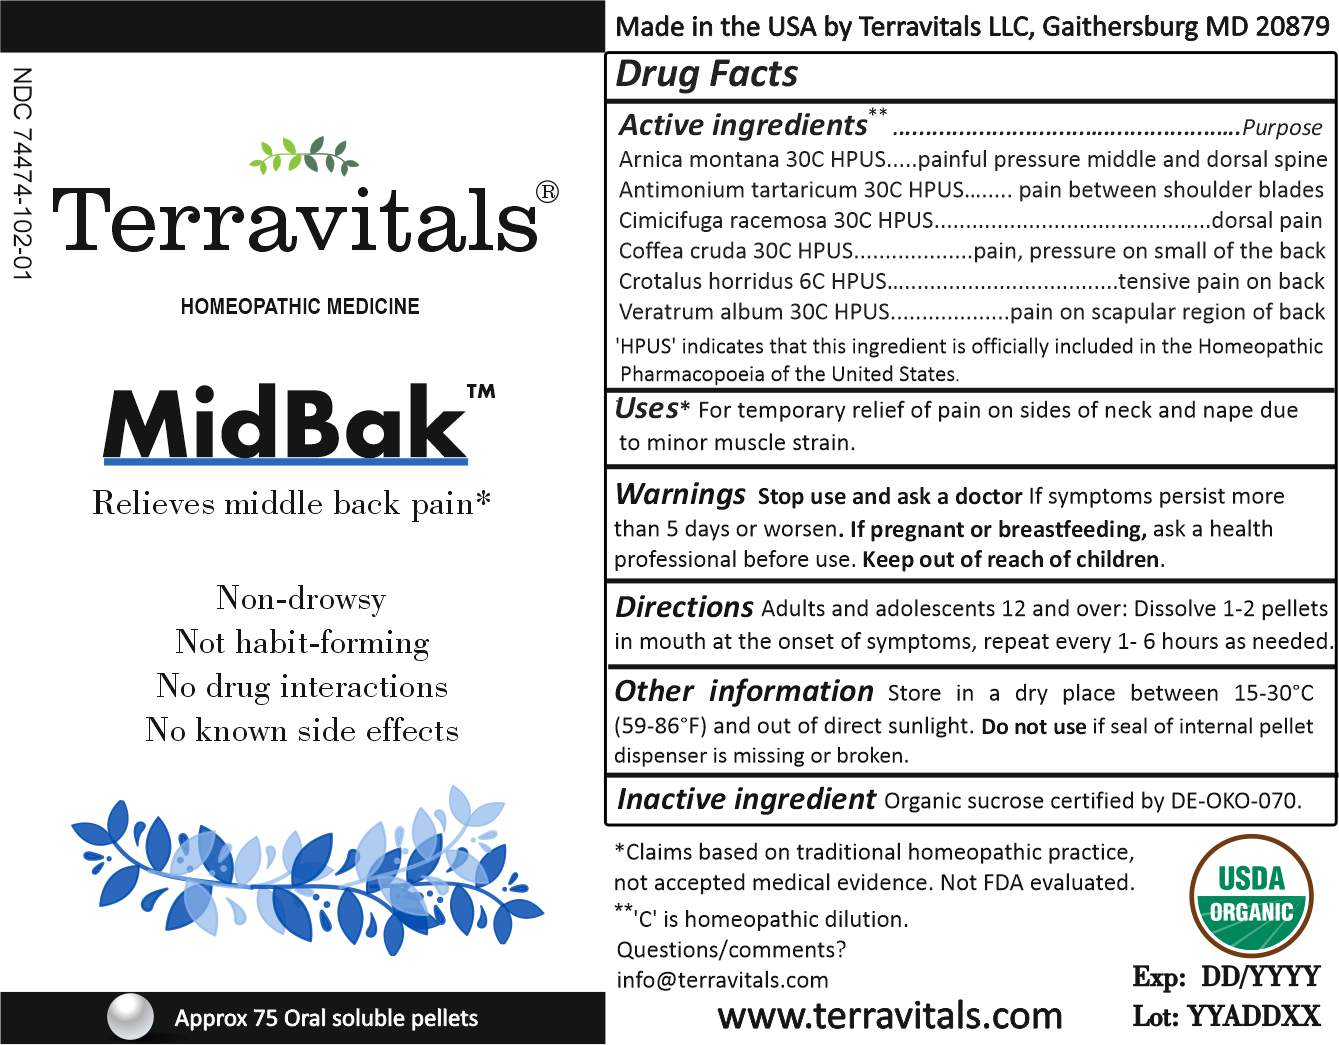 External packaging label